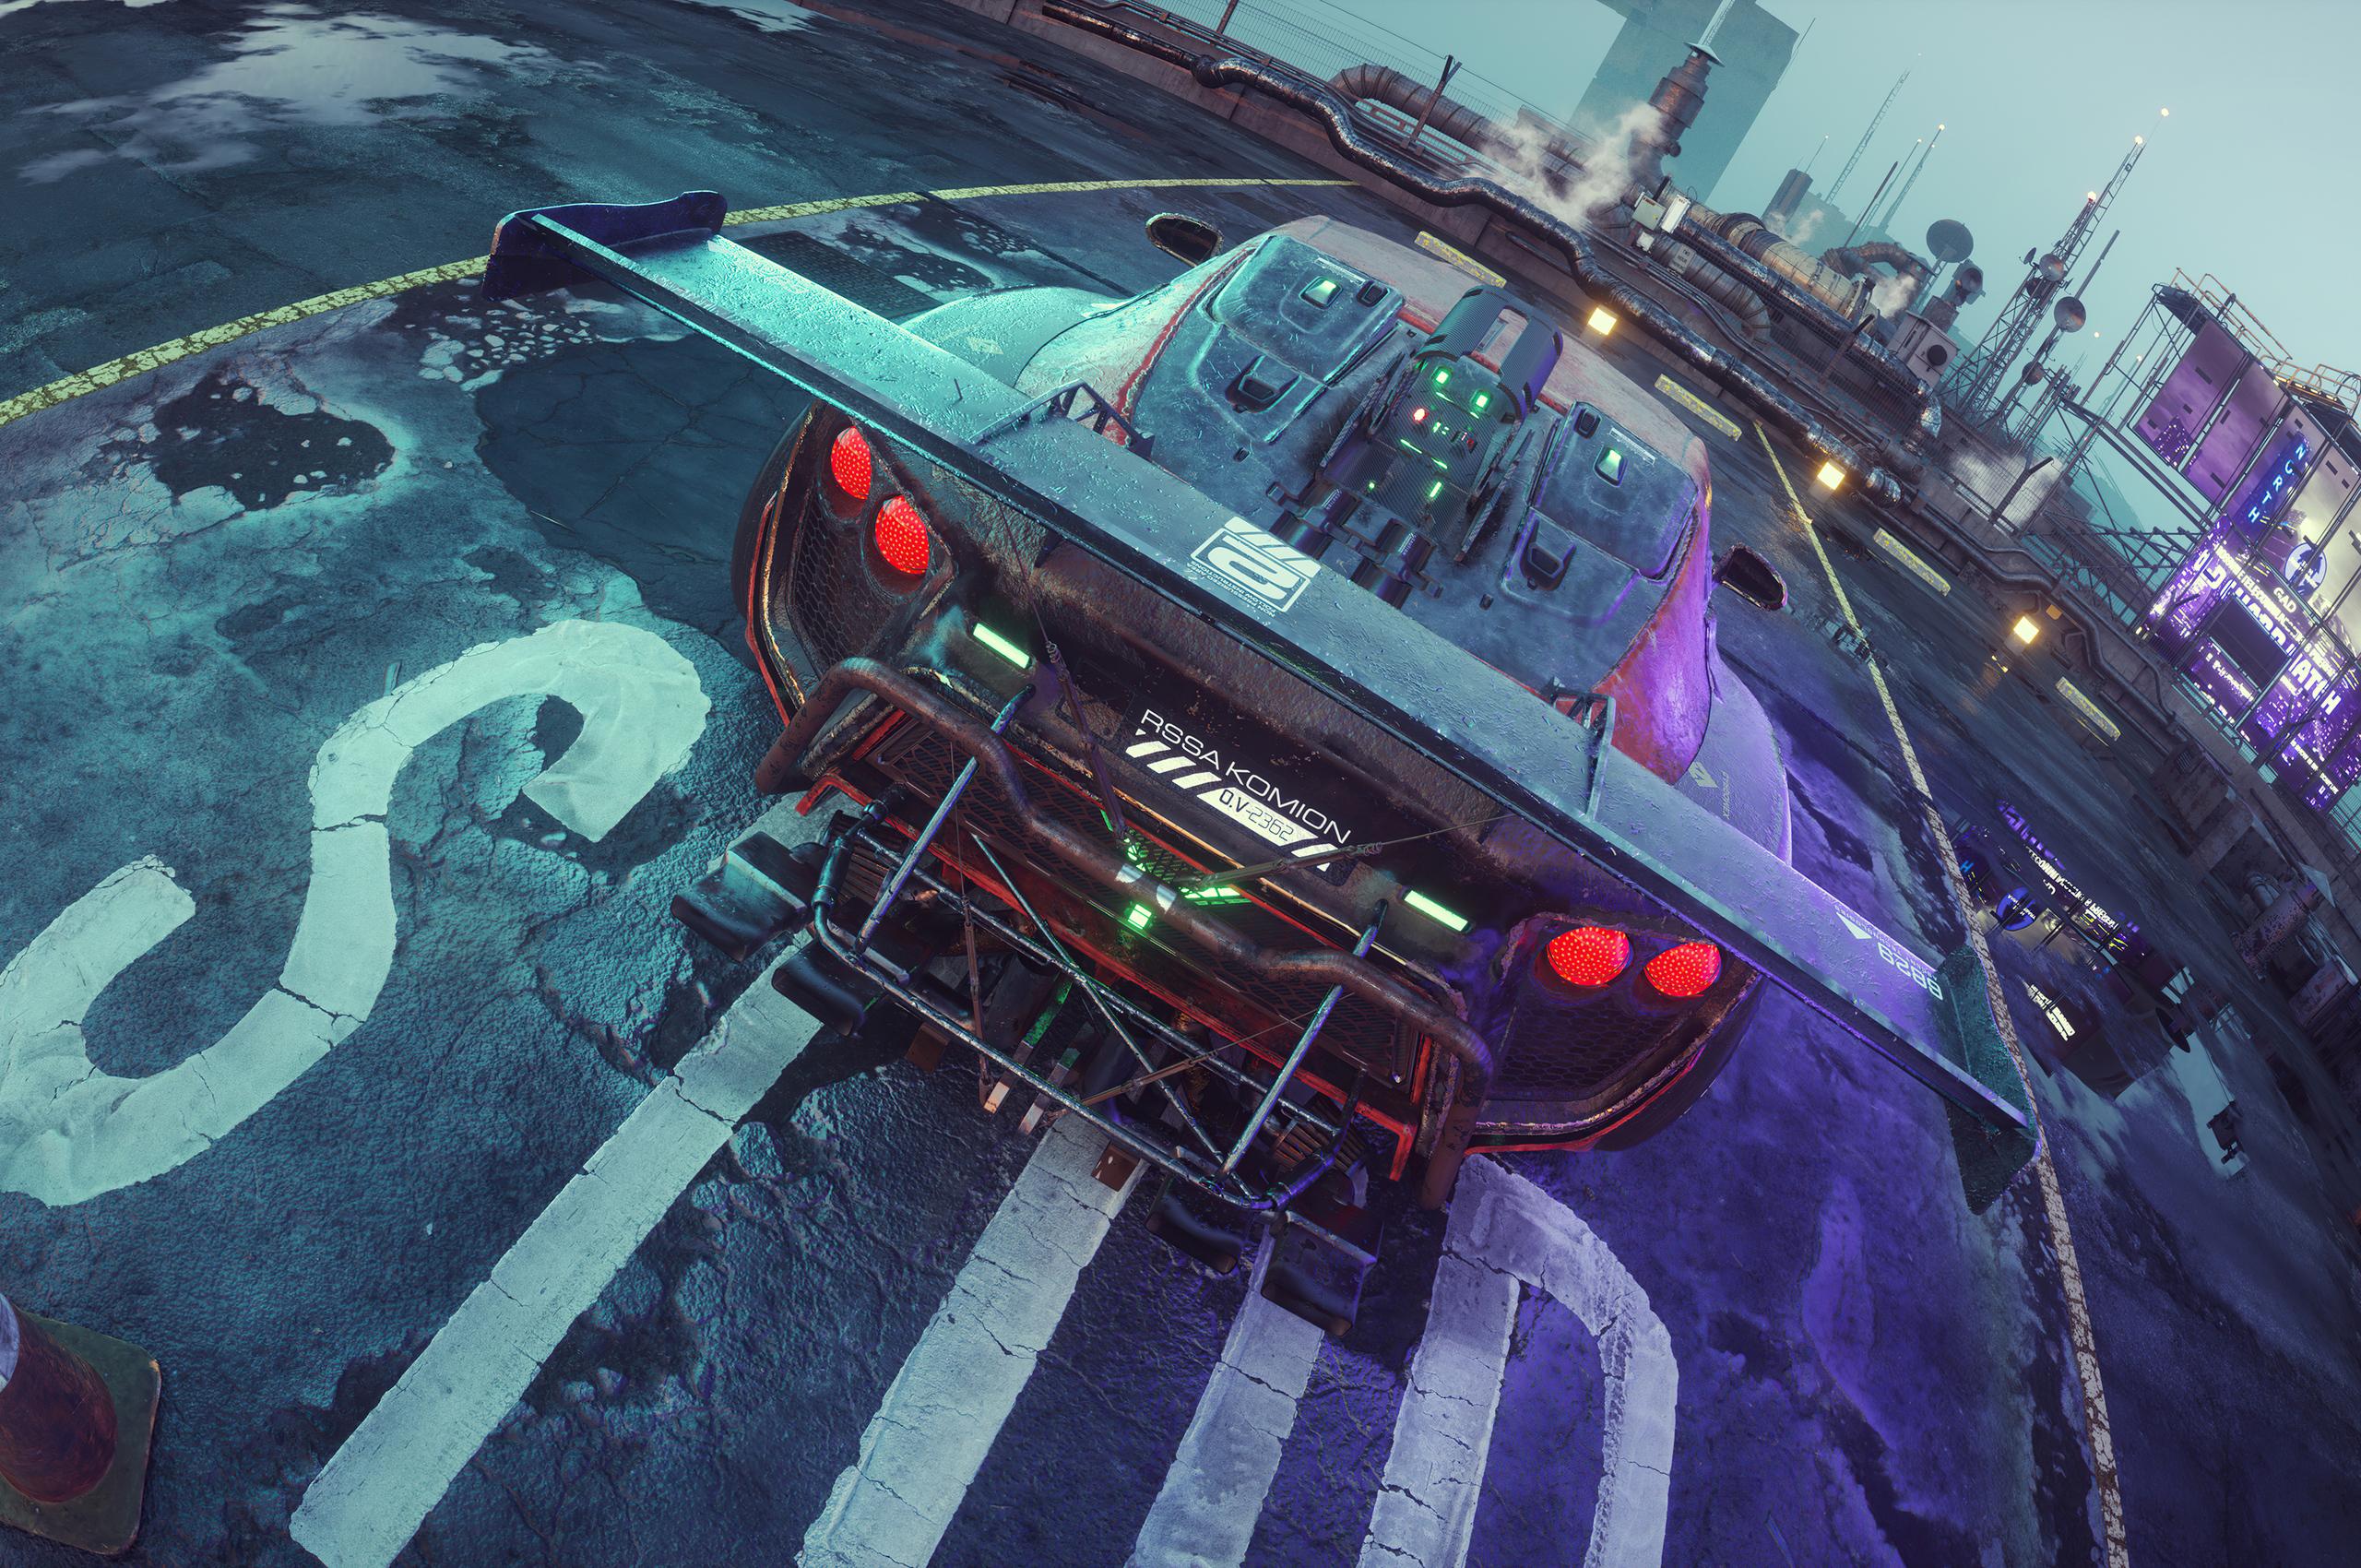 cyberpunkish-flanker-f-concept-car-s4.jpg